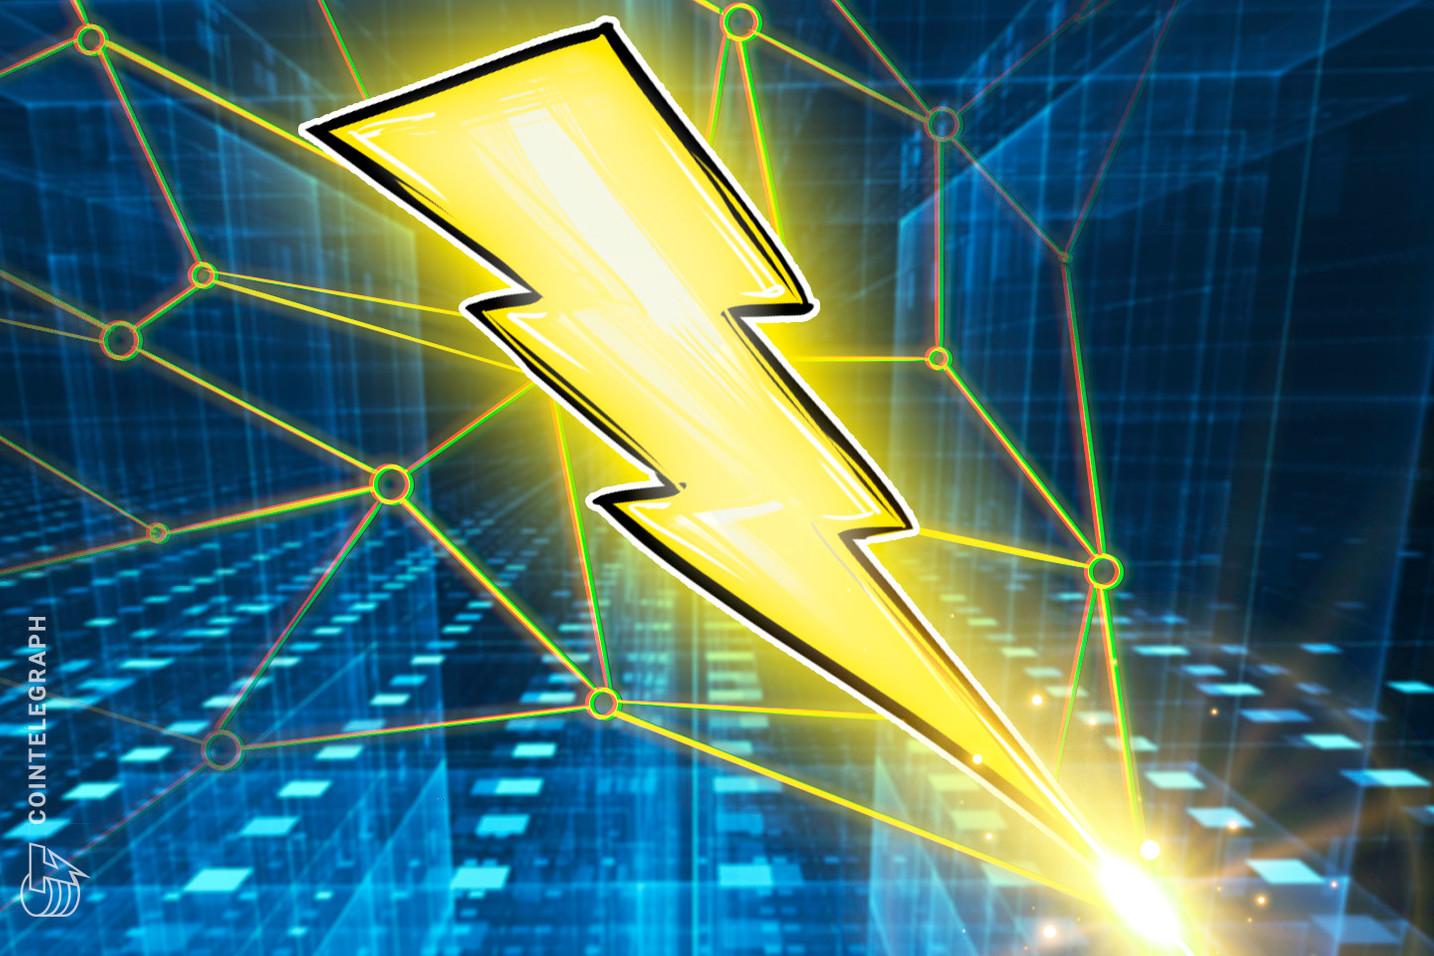 Major Spanish Energy Company to Use Blockchain in Renewable Energy Tracking